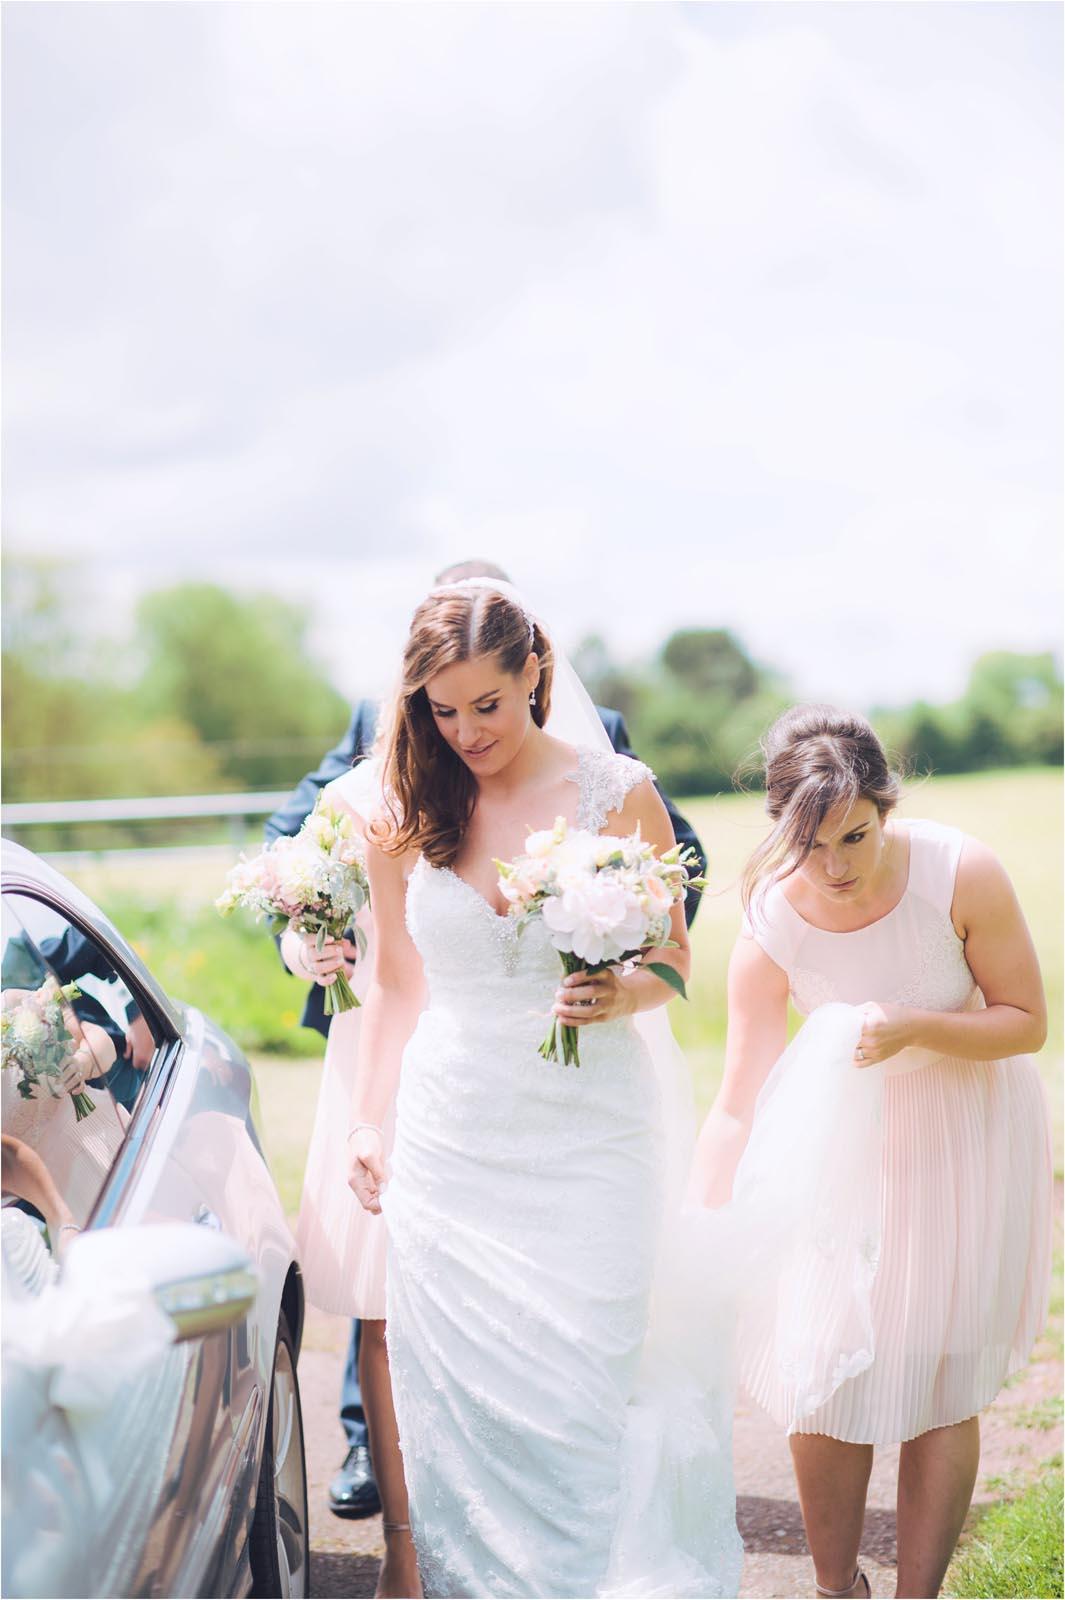 Simon biffen wedding photography 0055